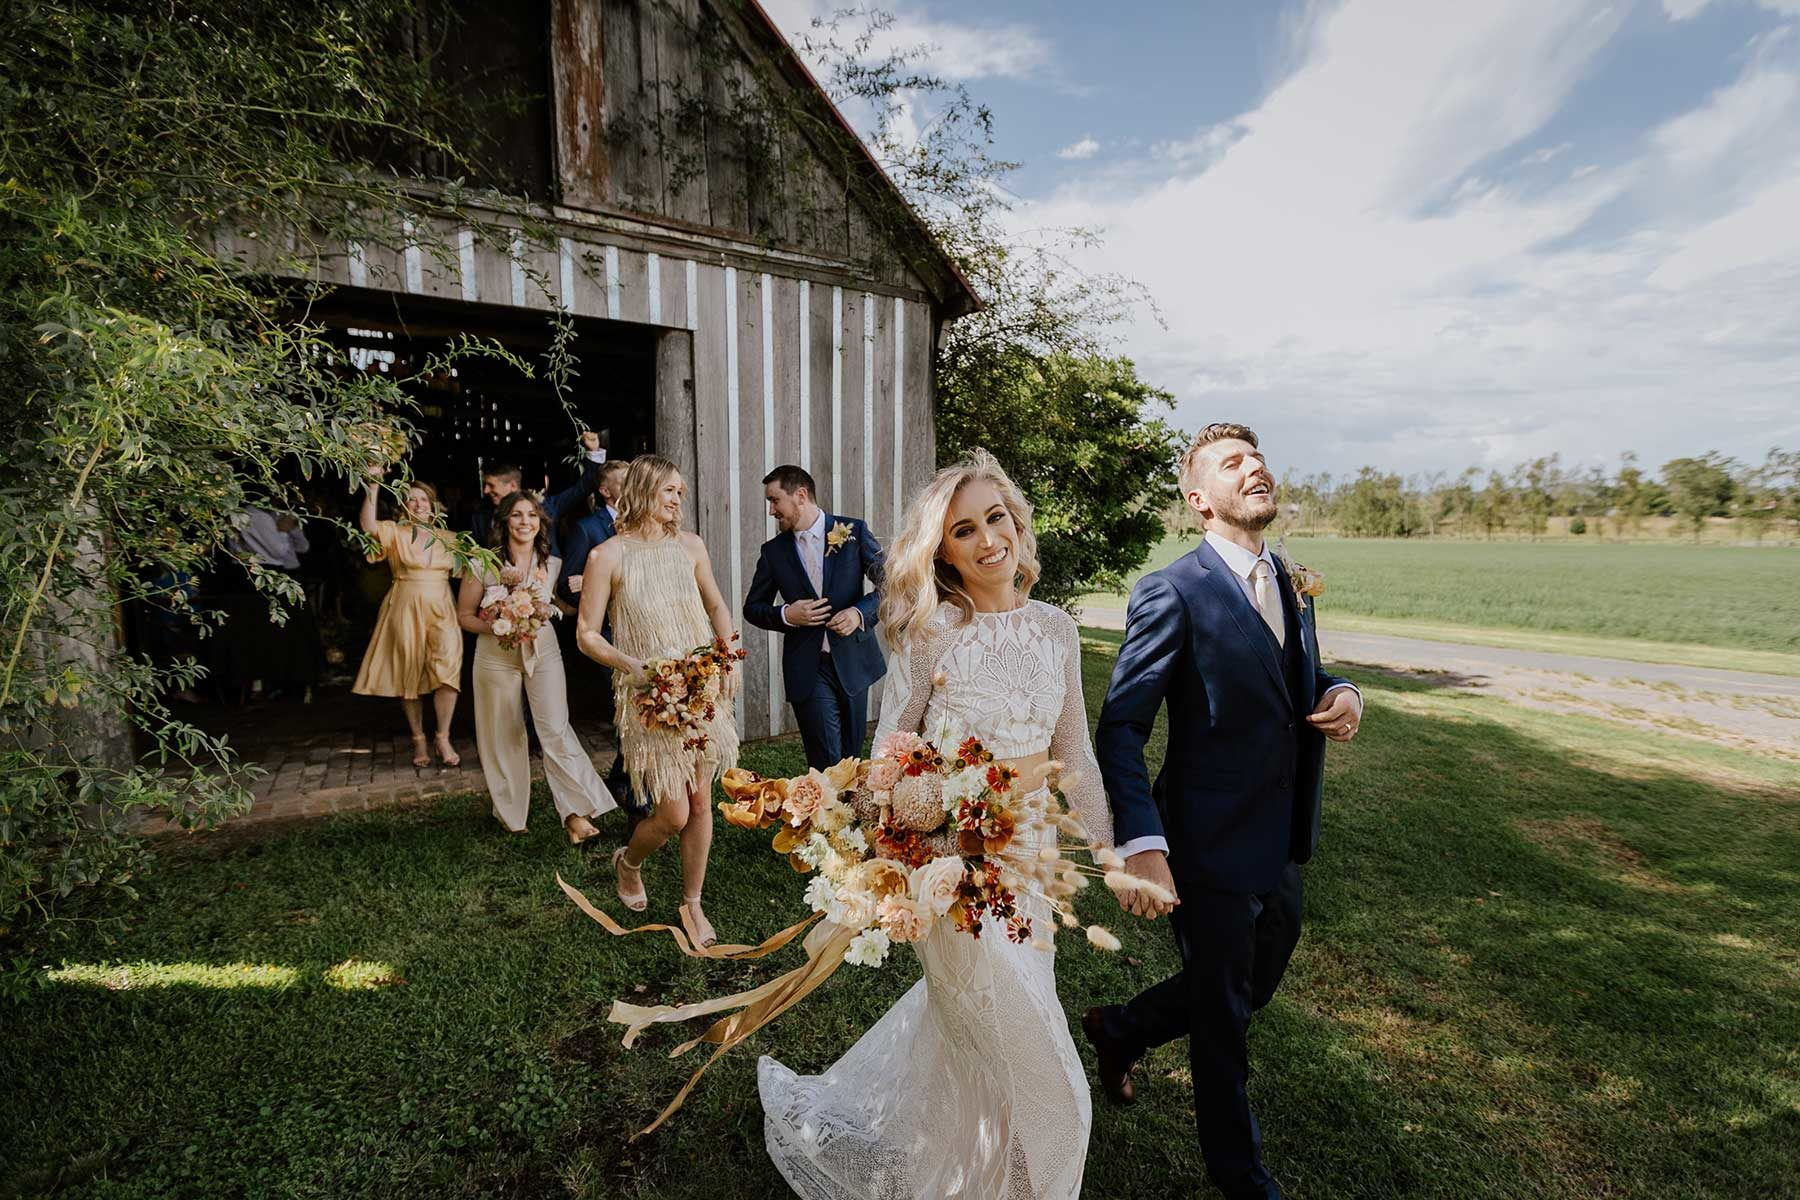 Hunter valley wedding venue barn